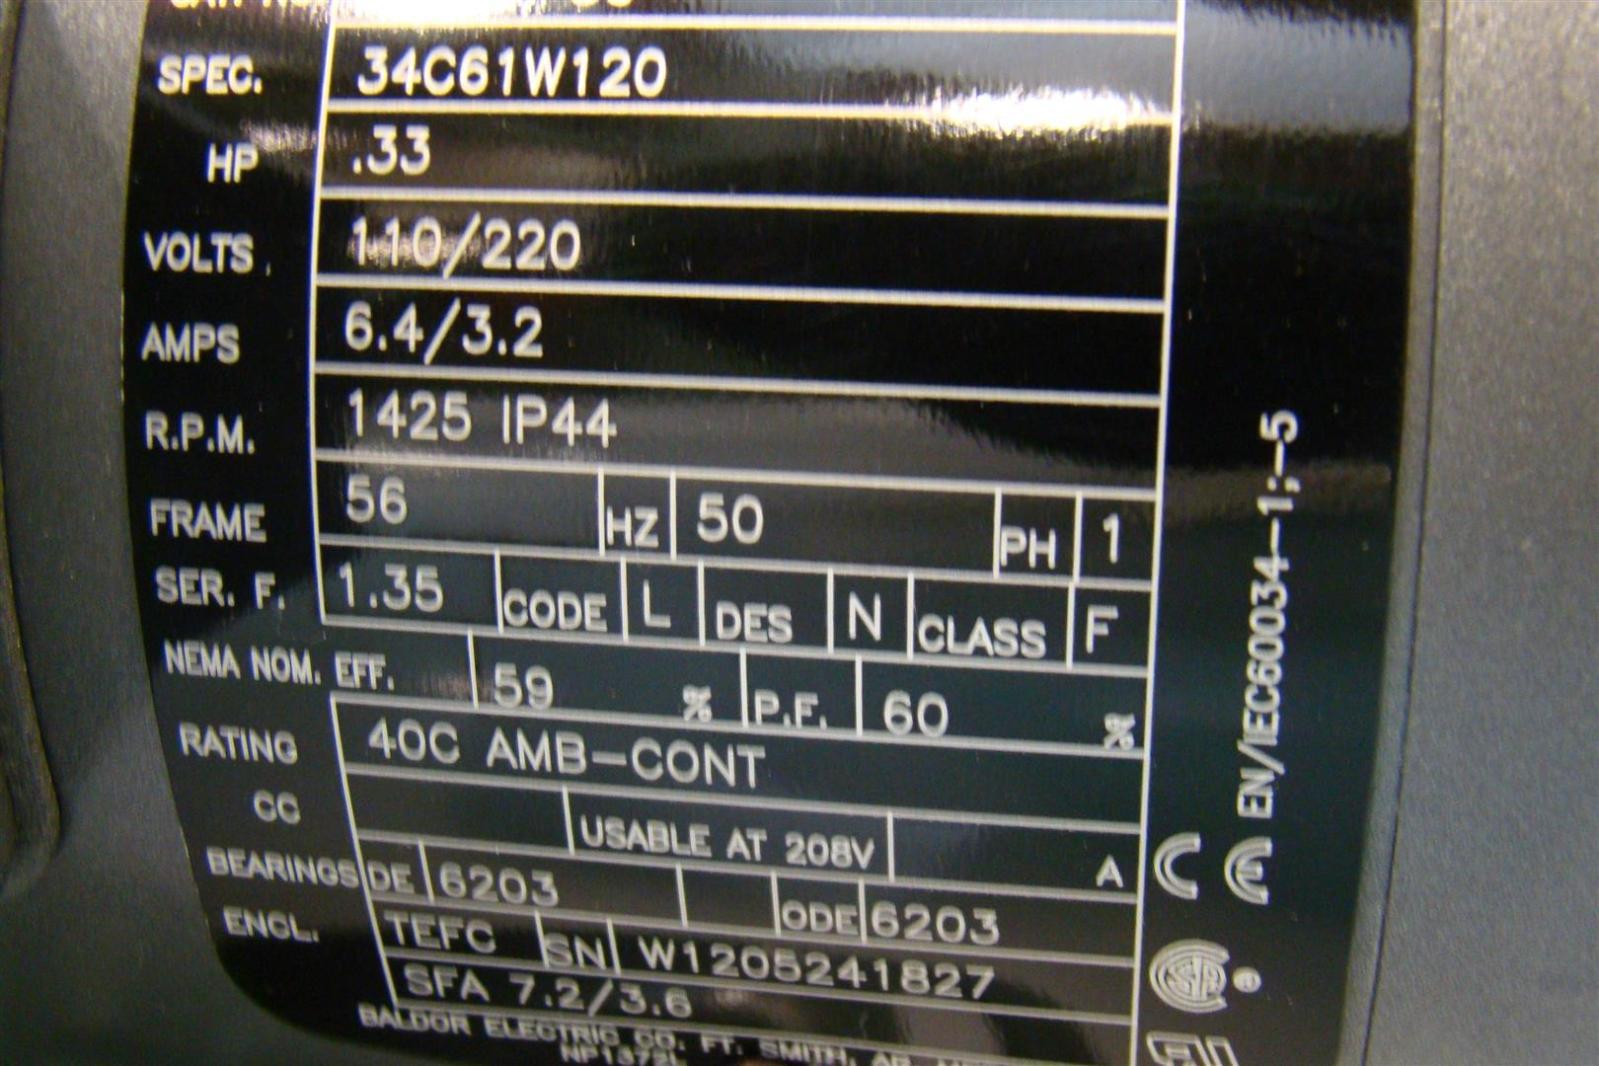 ... 110/220V SI... L3501